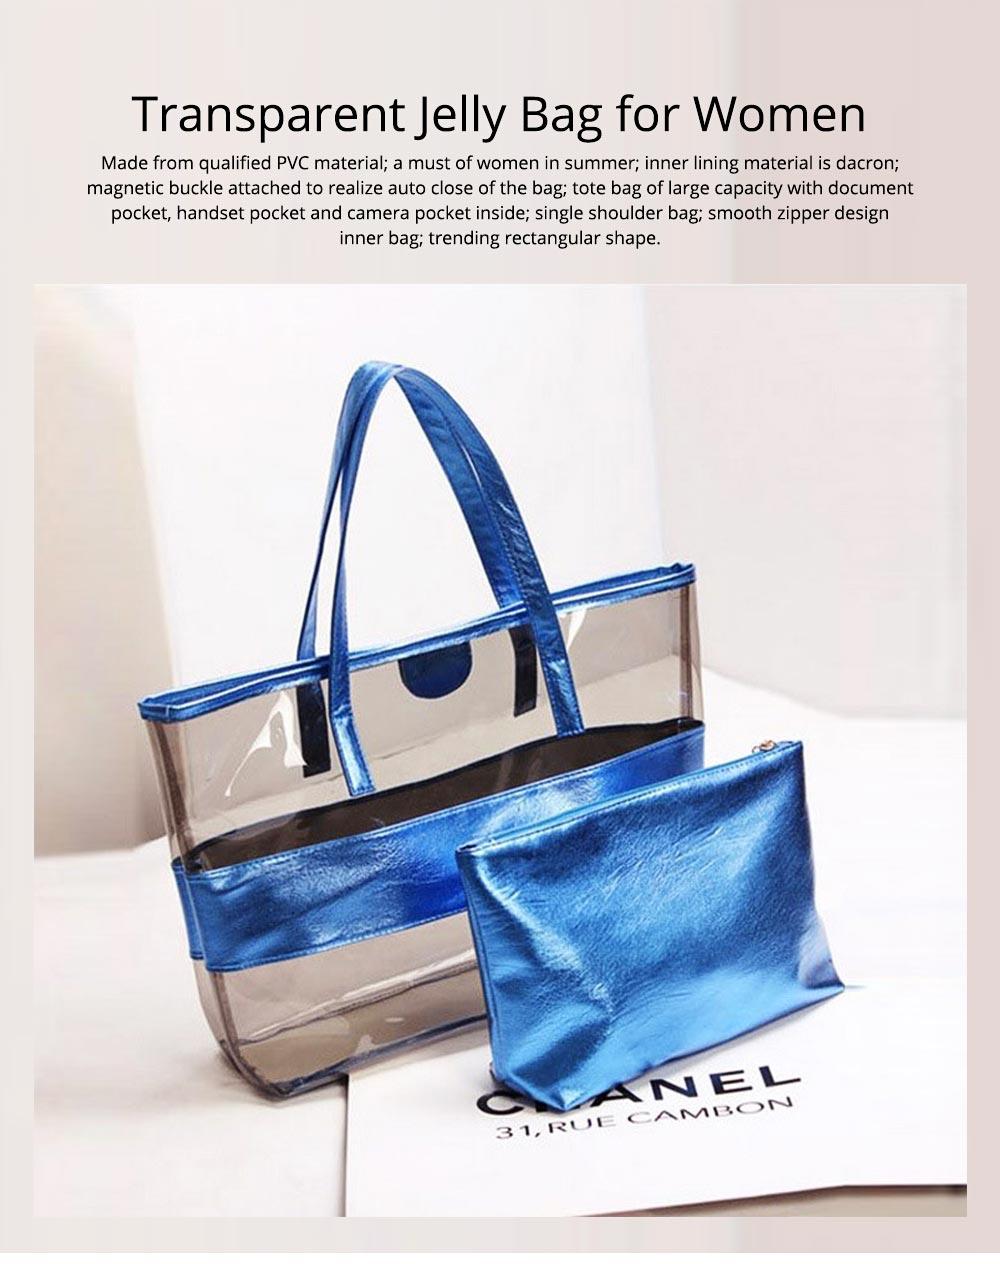 PVC Waterproof Transparent Bag for Women Summer Use, Crystal Tote Bag, Neon Color Jelly Single Shoulder Handbag 0